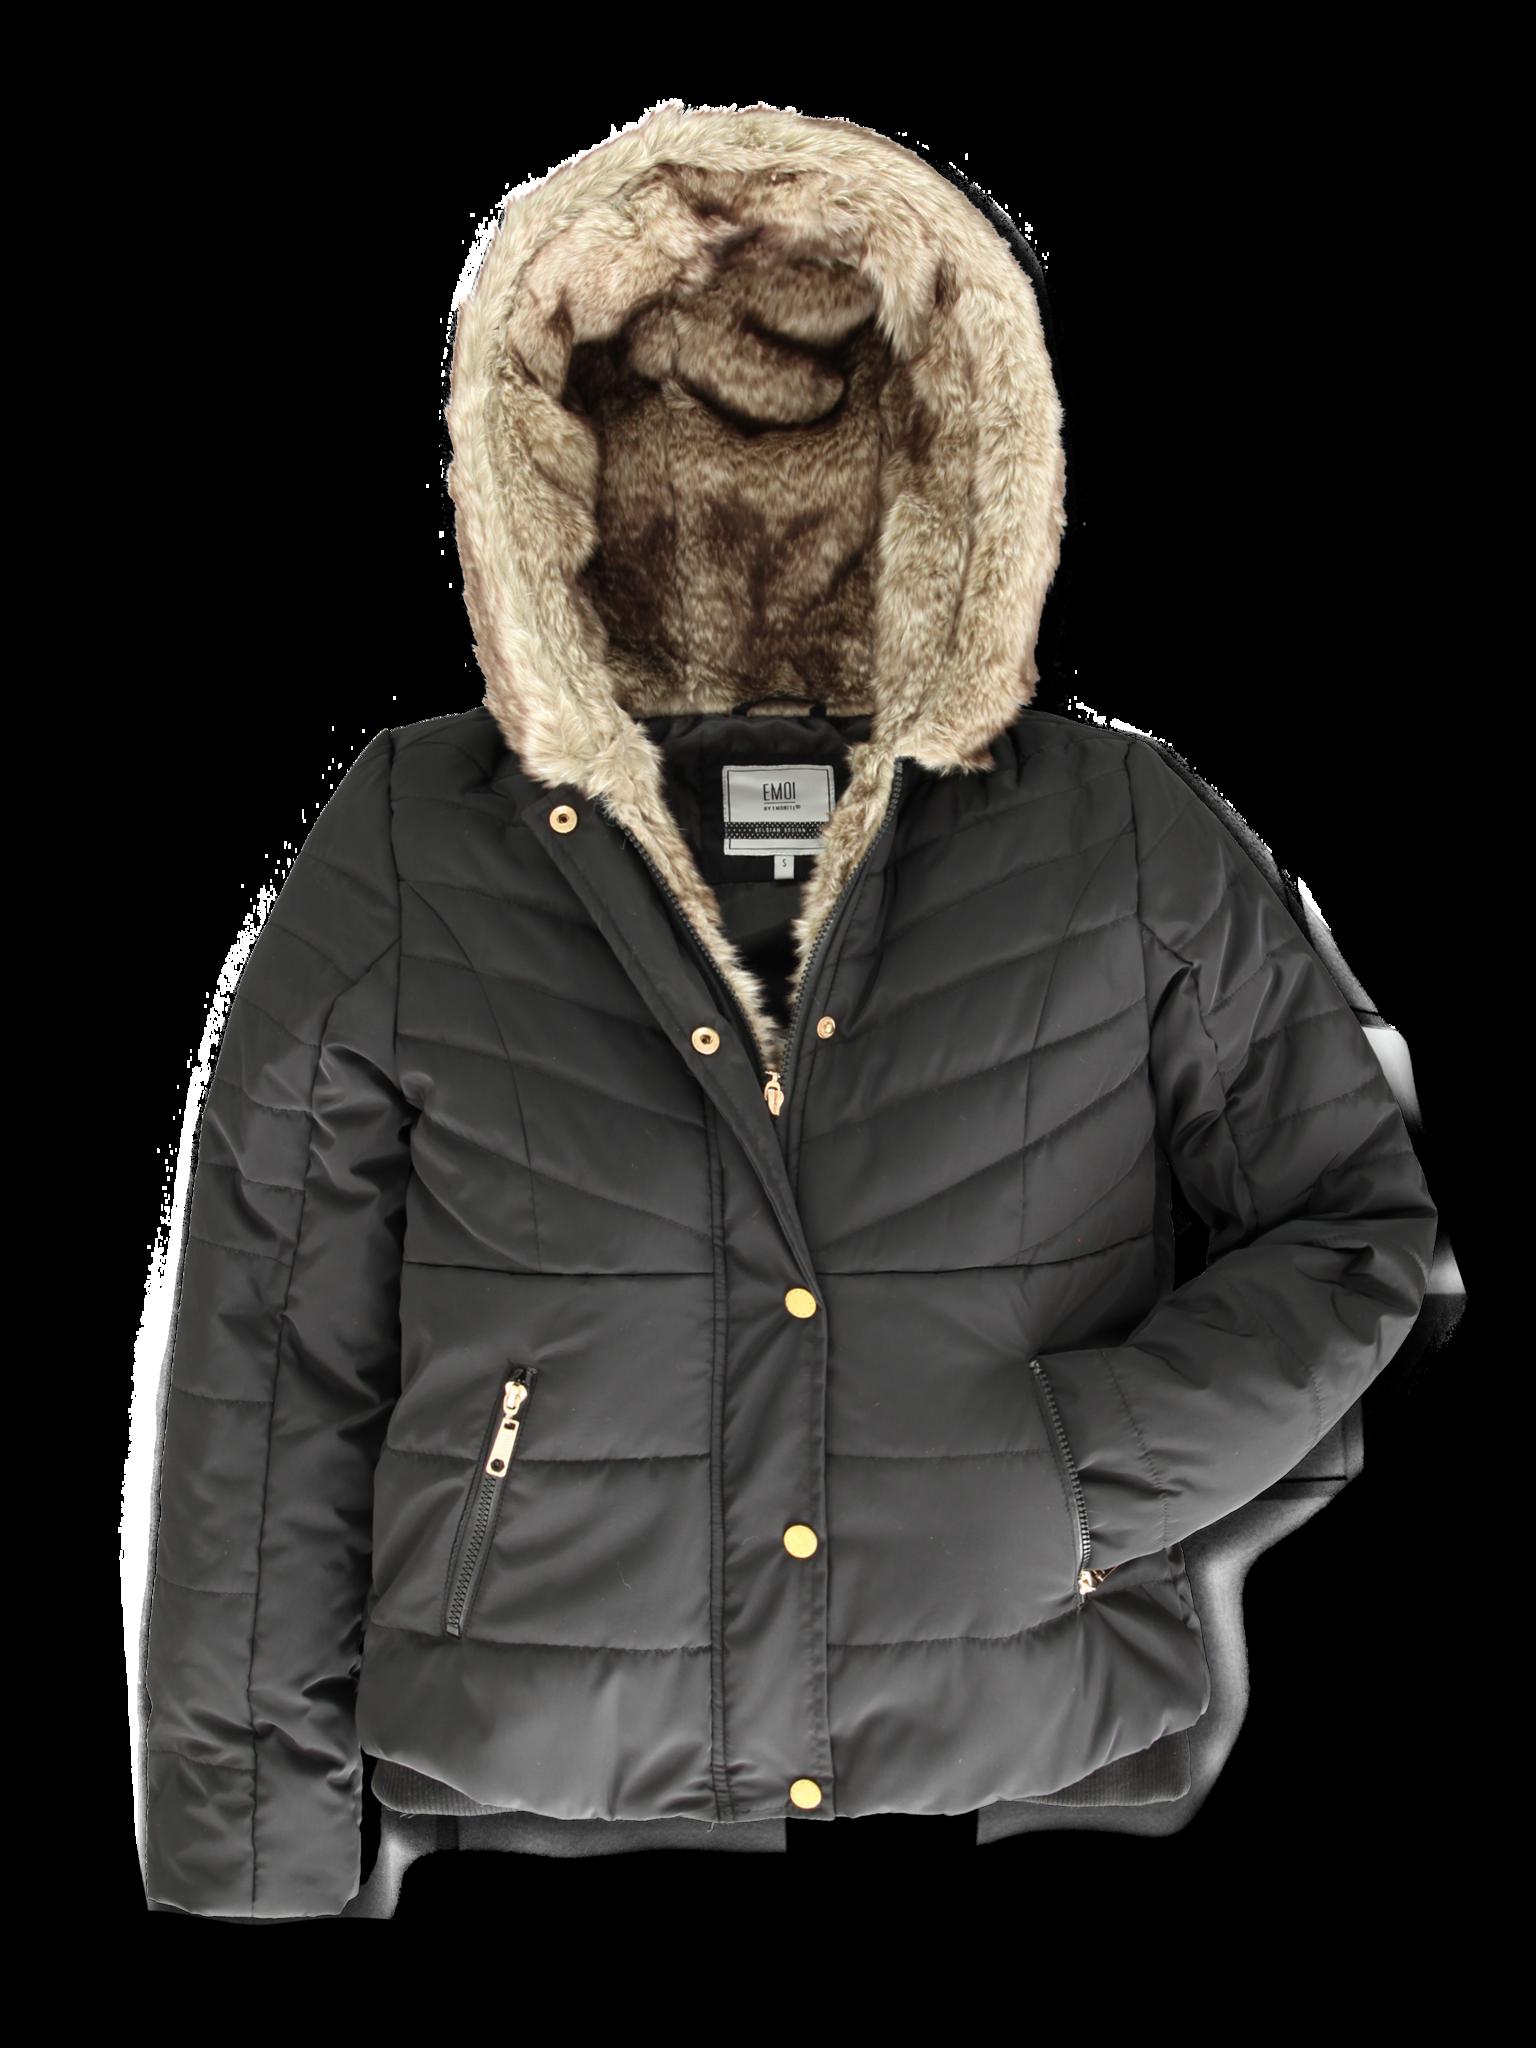 Emoi   Winter 2019 Ladies   Jacket   15 pcs/box